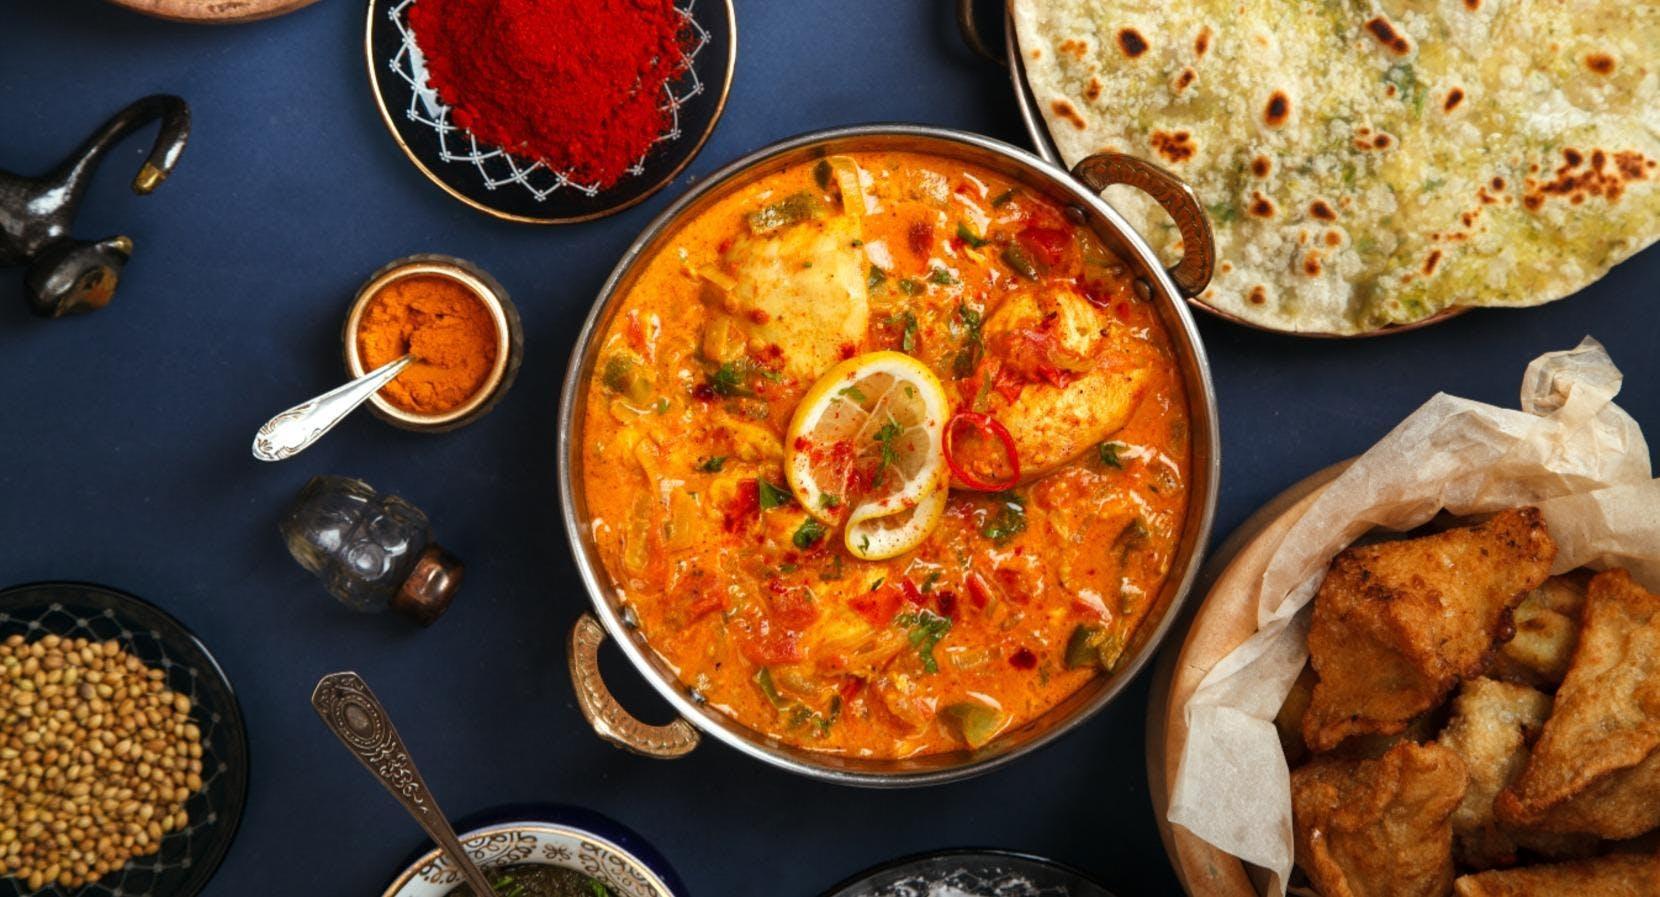 Zaal Indian Restaurant